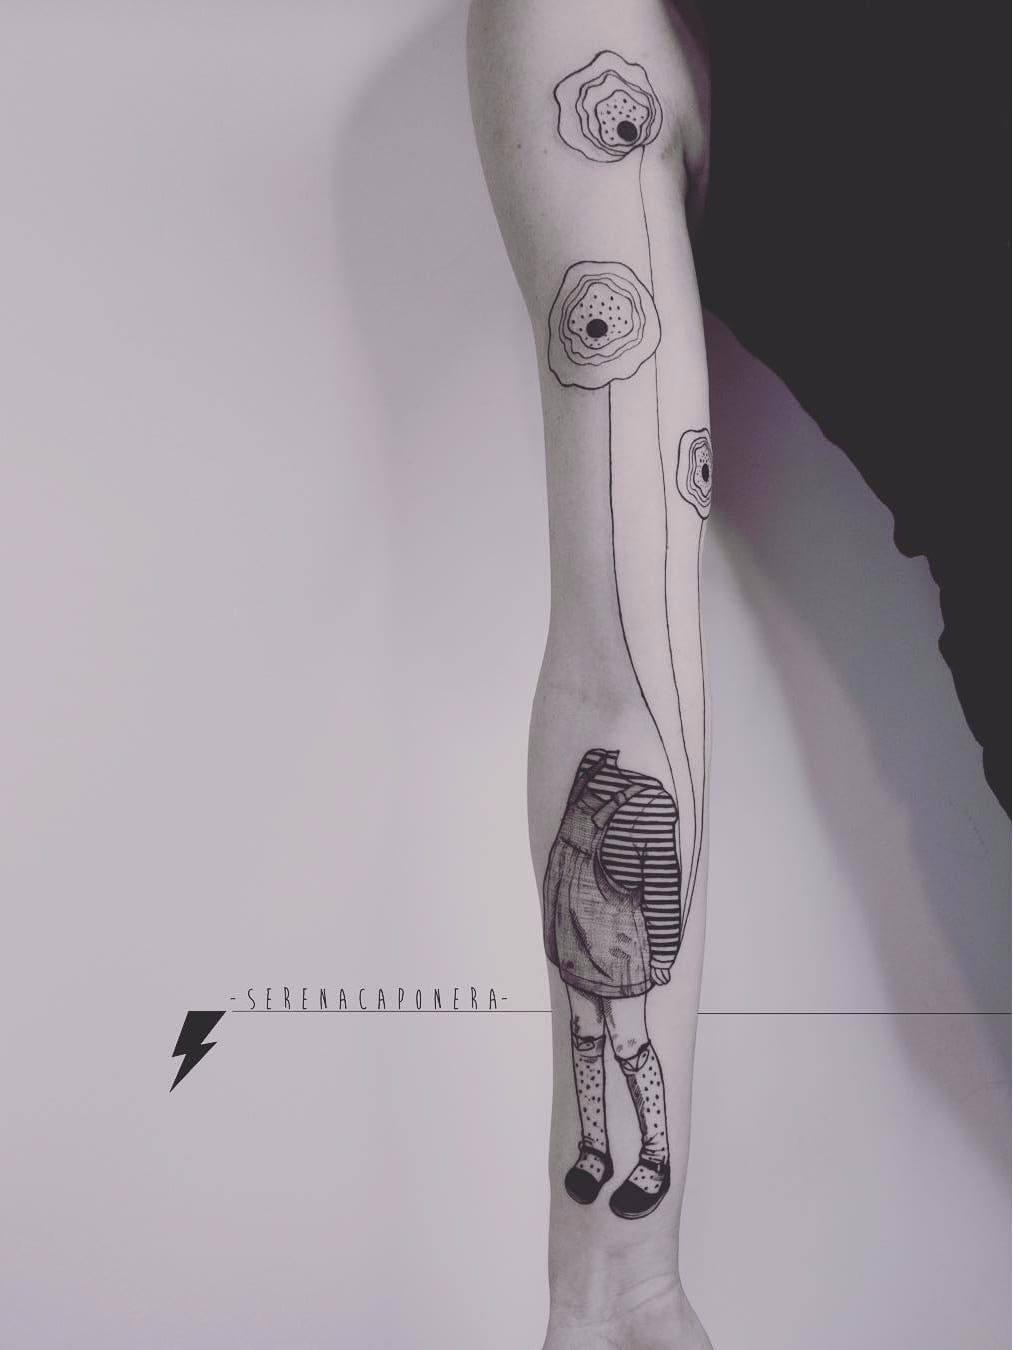 Cabeça de vento #SerenaCaponera #gringa #blackwork #grafico #graphic #vintage #menina #girl #balao #baloon